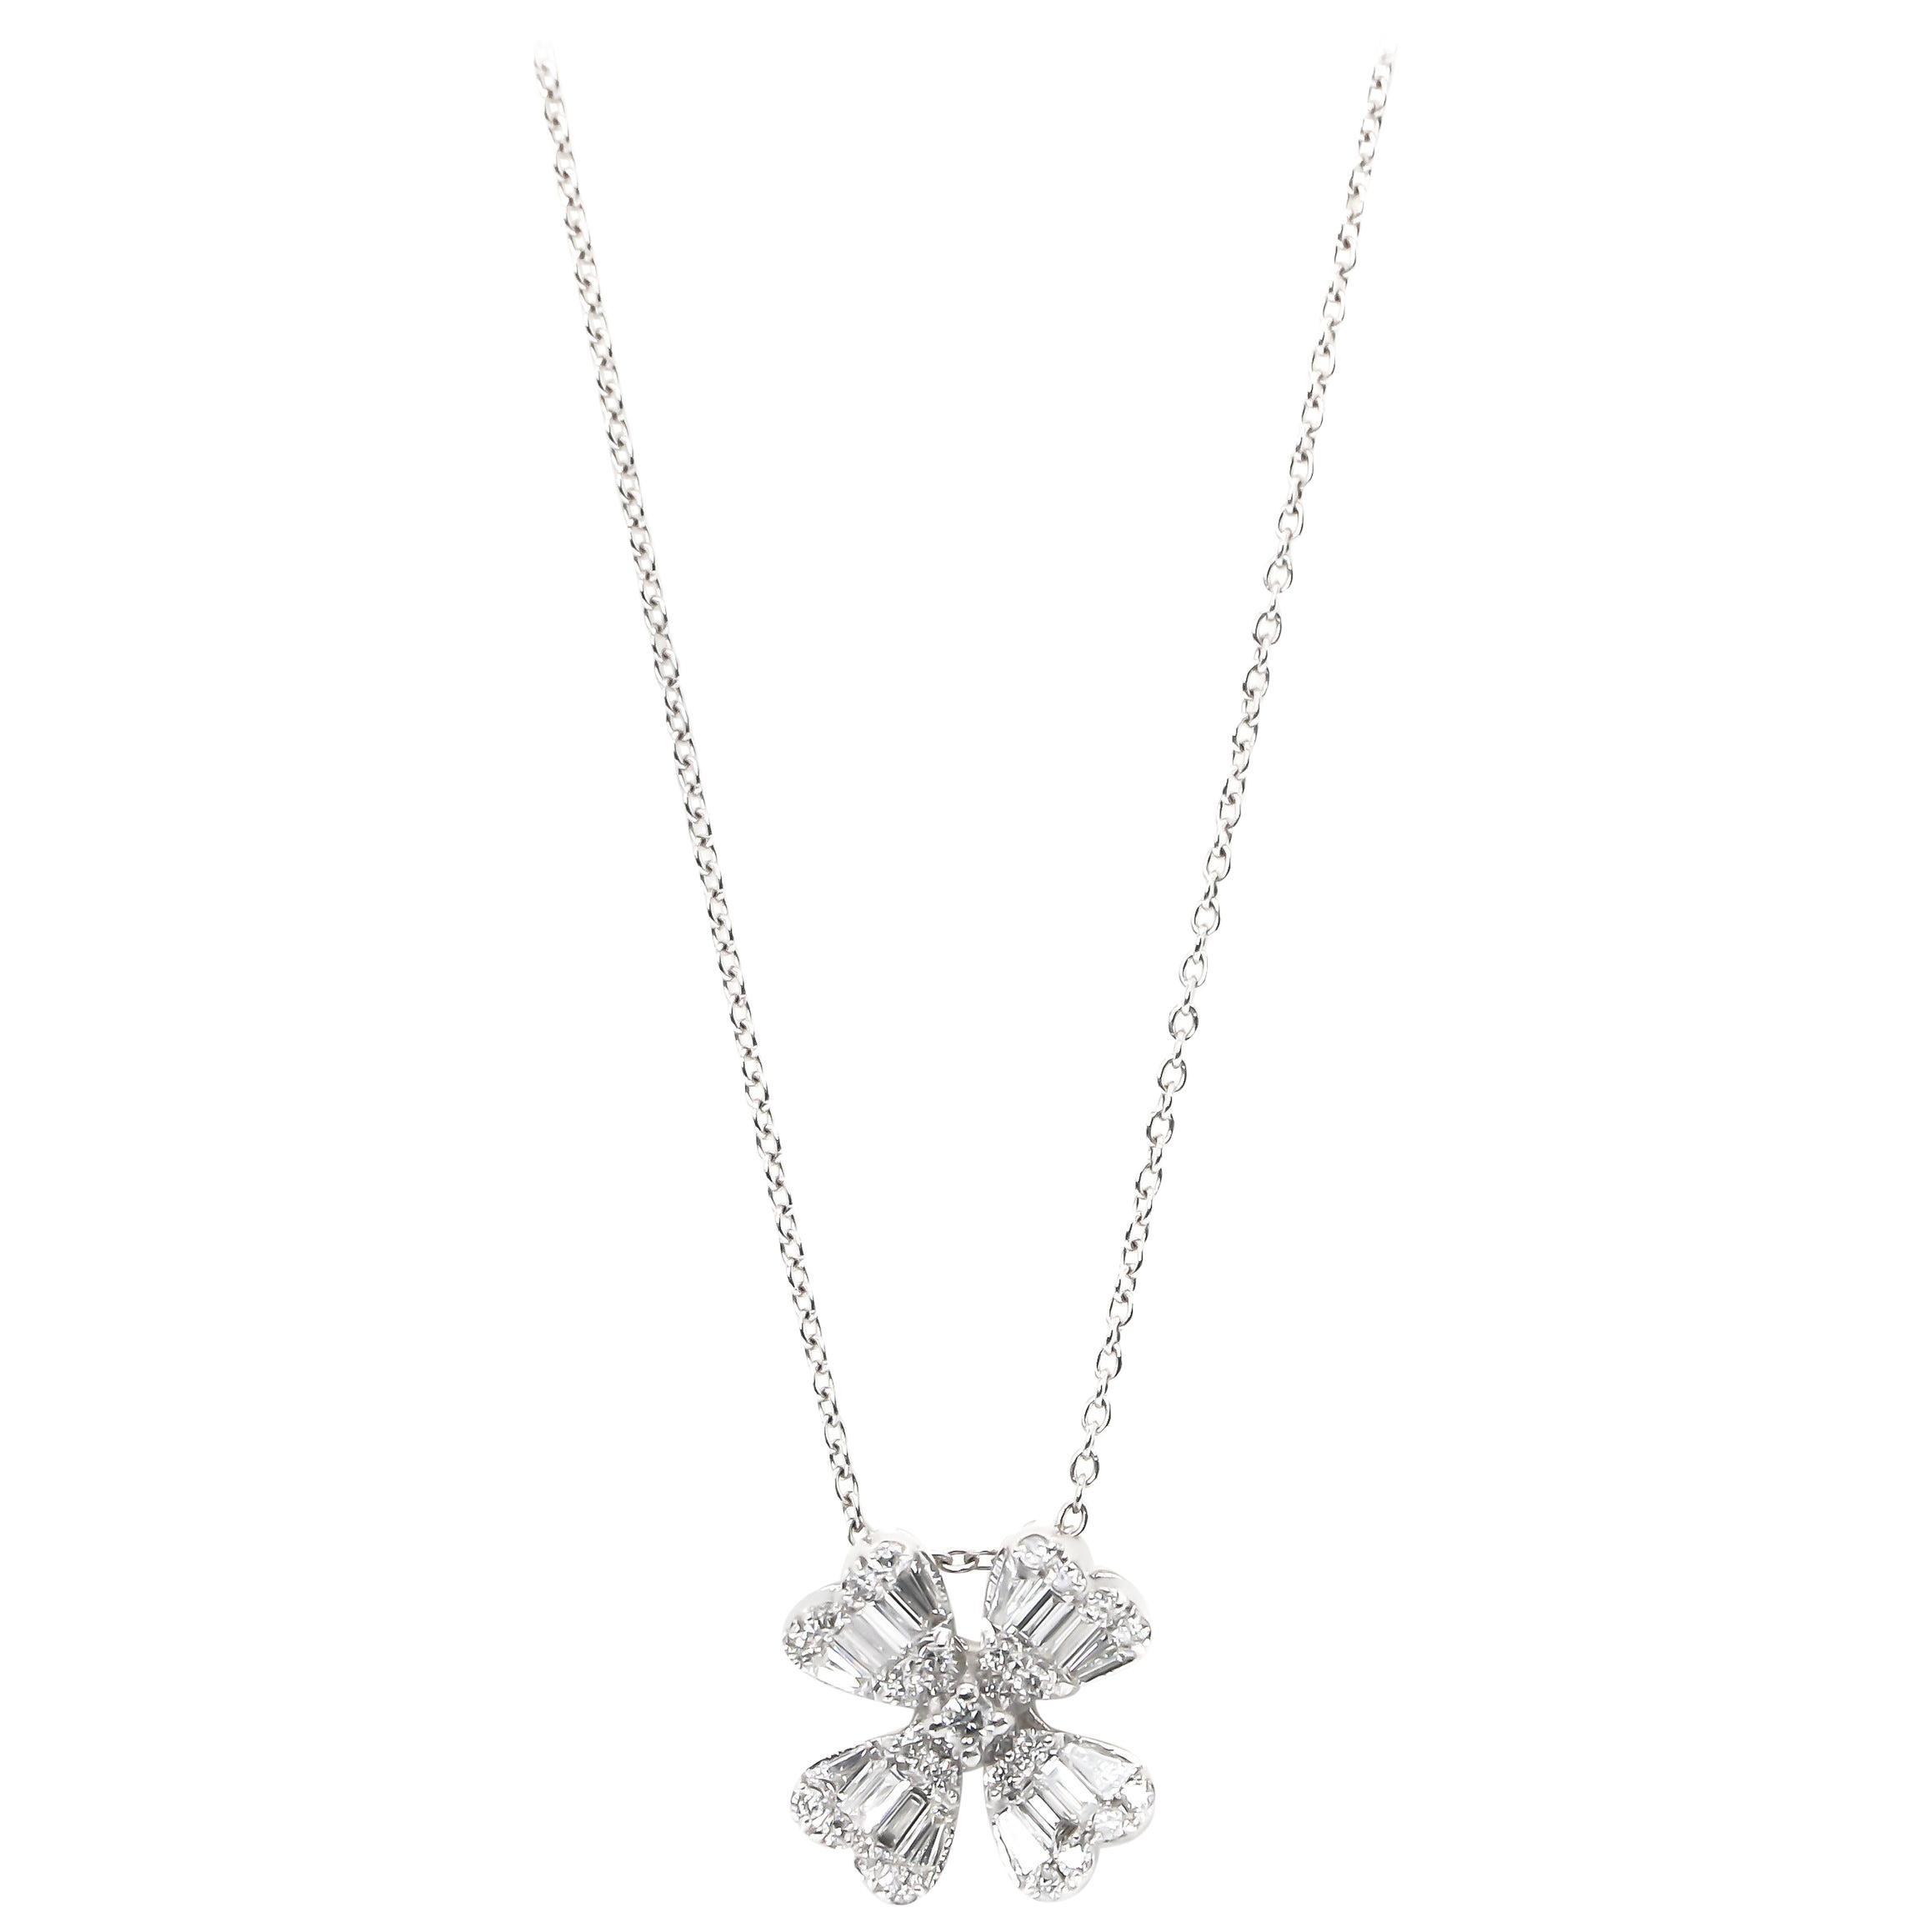 Diamond Flower Necklace 45 Diamonds 0.72 Carat 18 Karat Gold